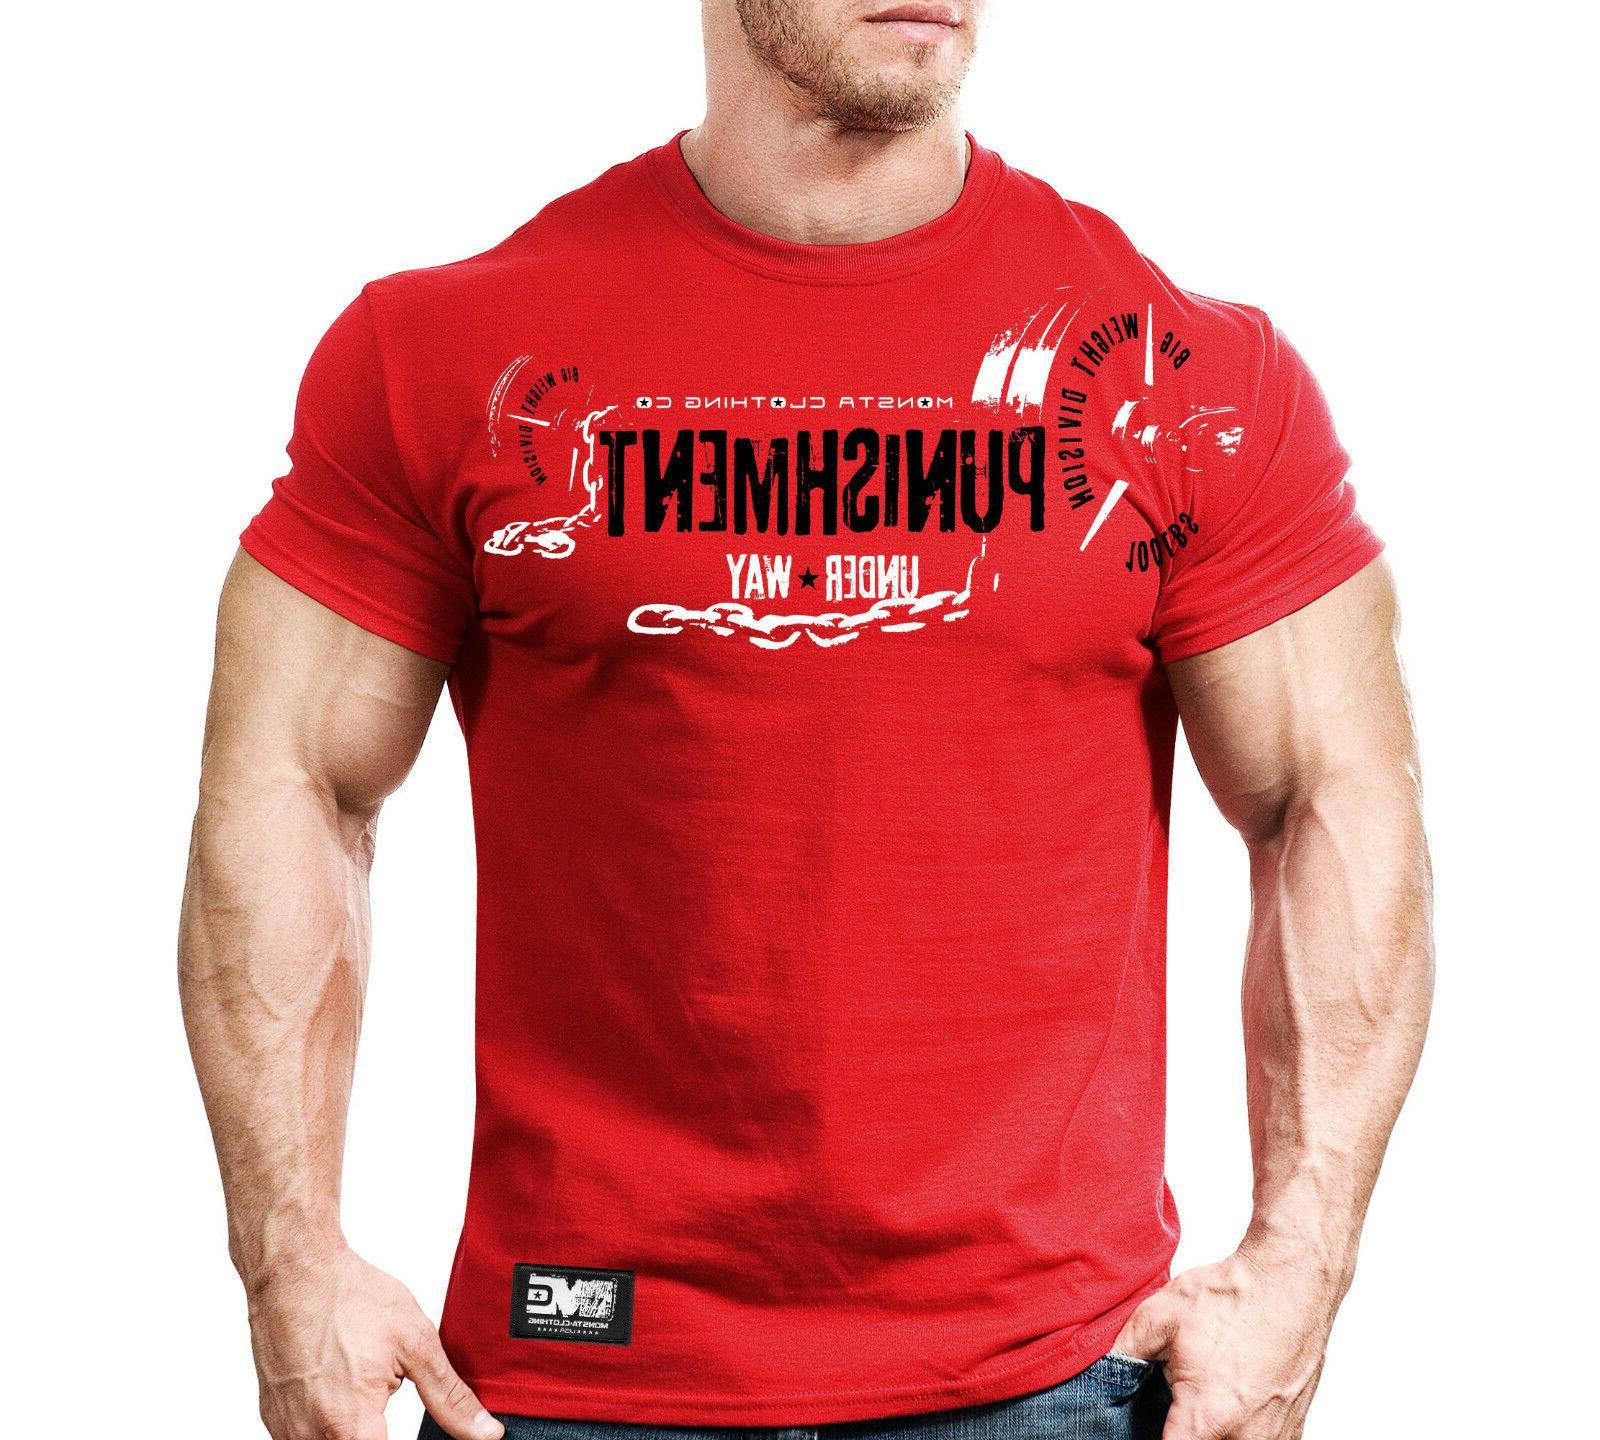 New Mens Monsta Fitness Workout T-shirt - Punishment